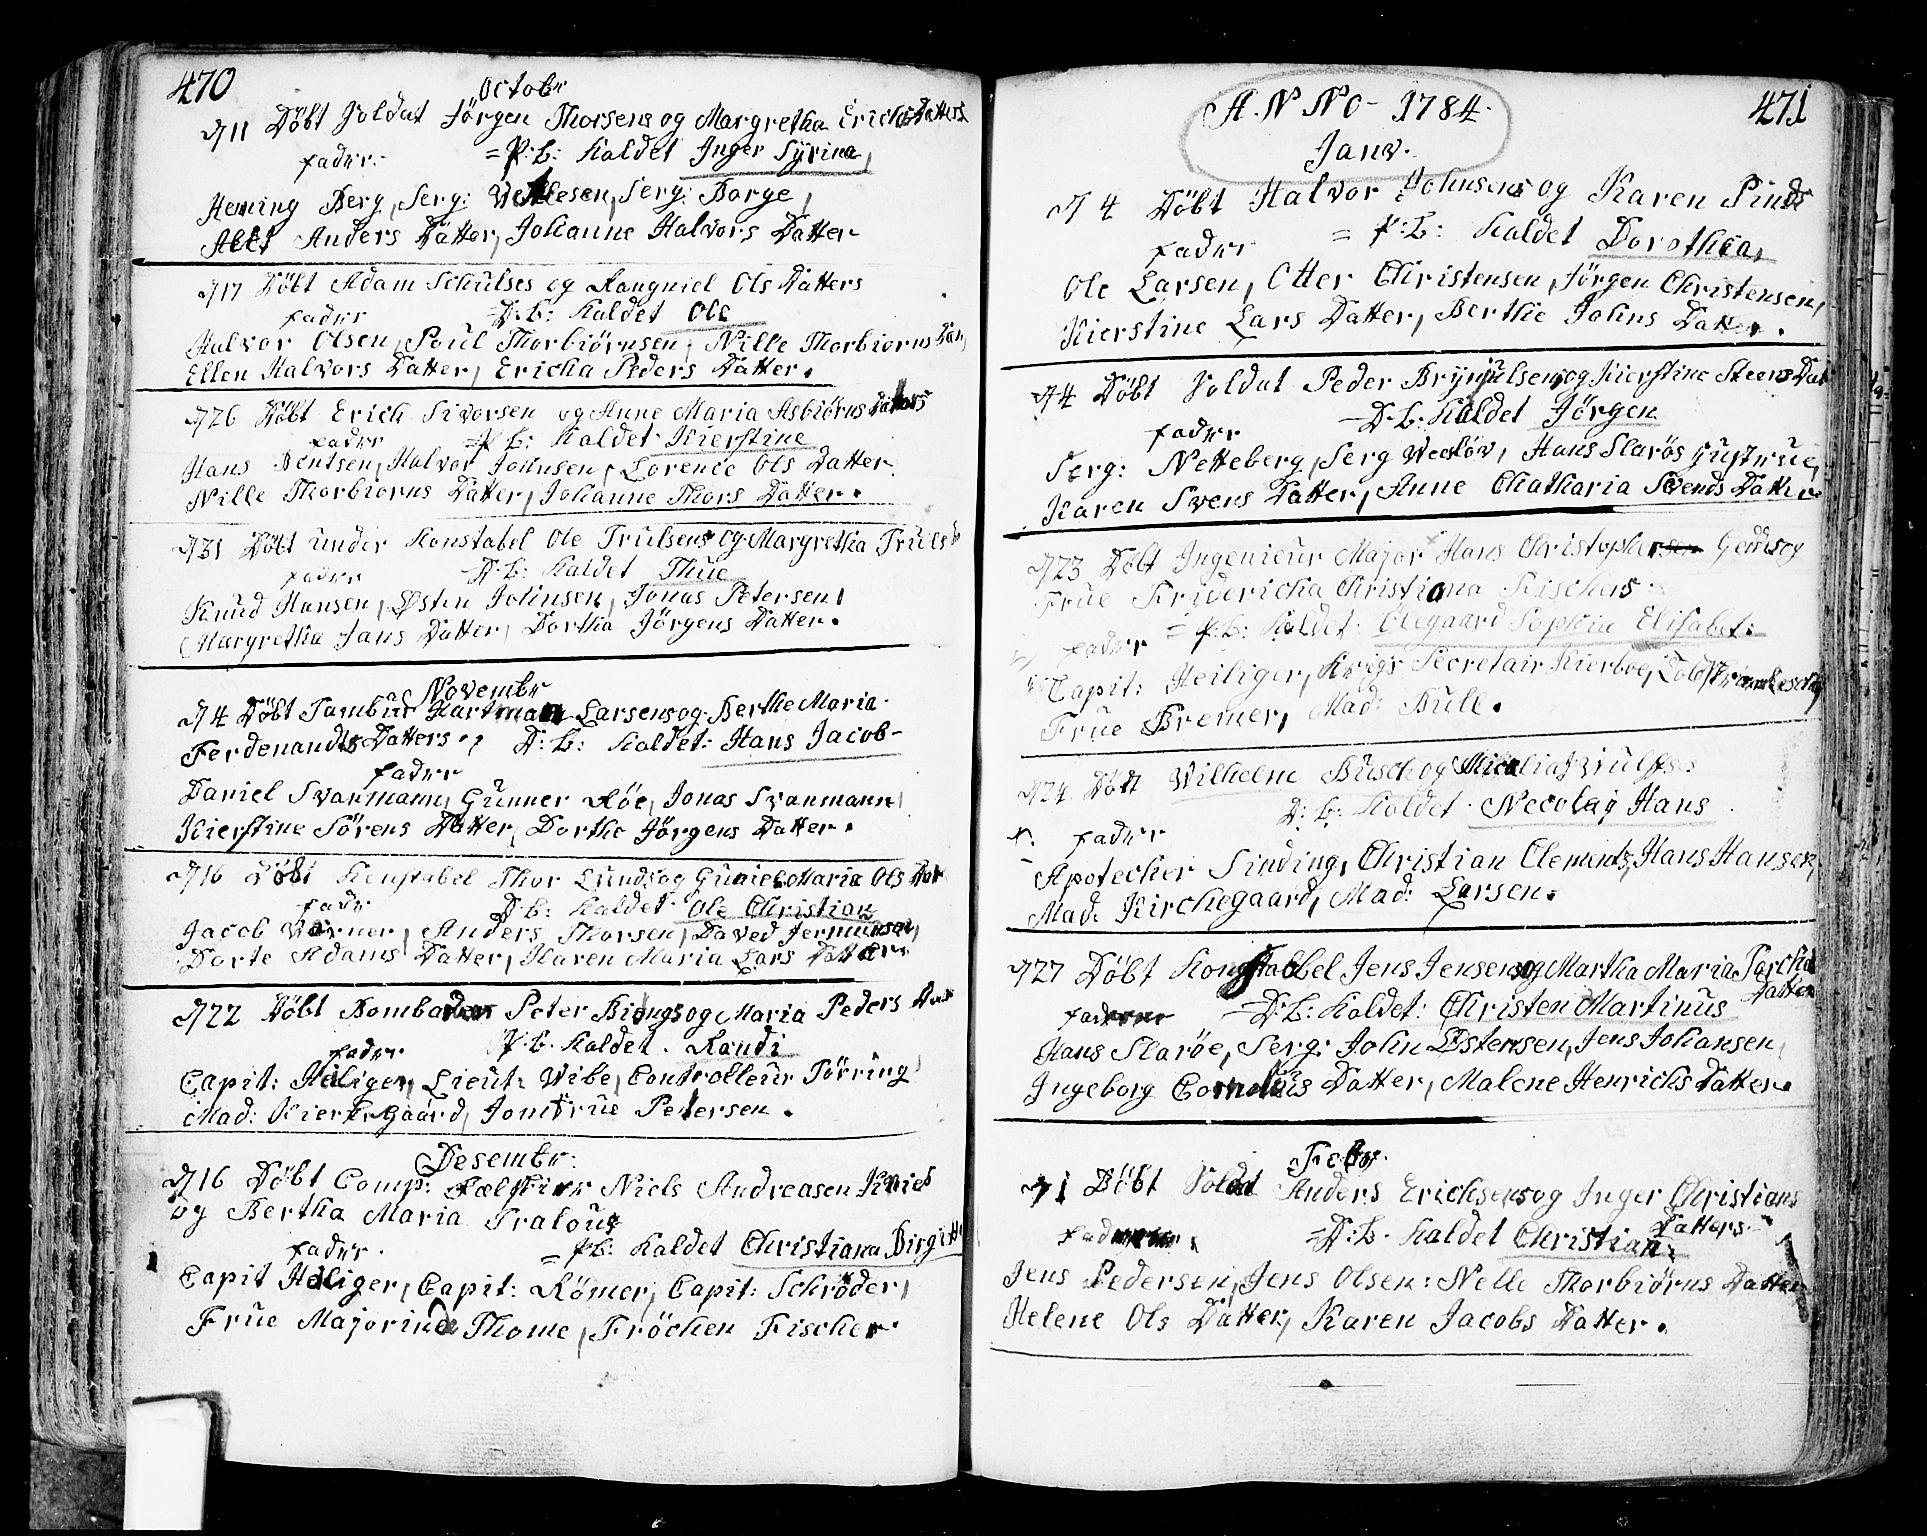 SAO, Fredrikstad prestekontor Kirkebøker, F/Fa/L0002: Ministerialbok nr. 2, 1750-1804, s. 470-471